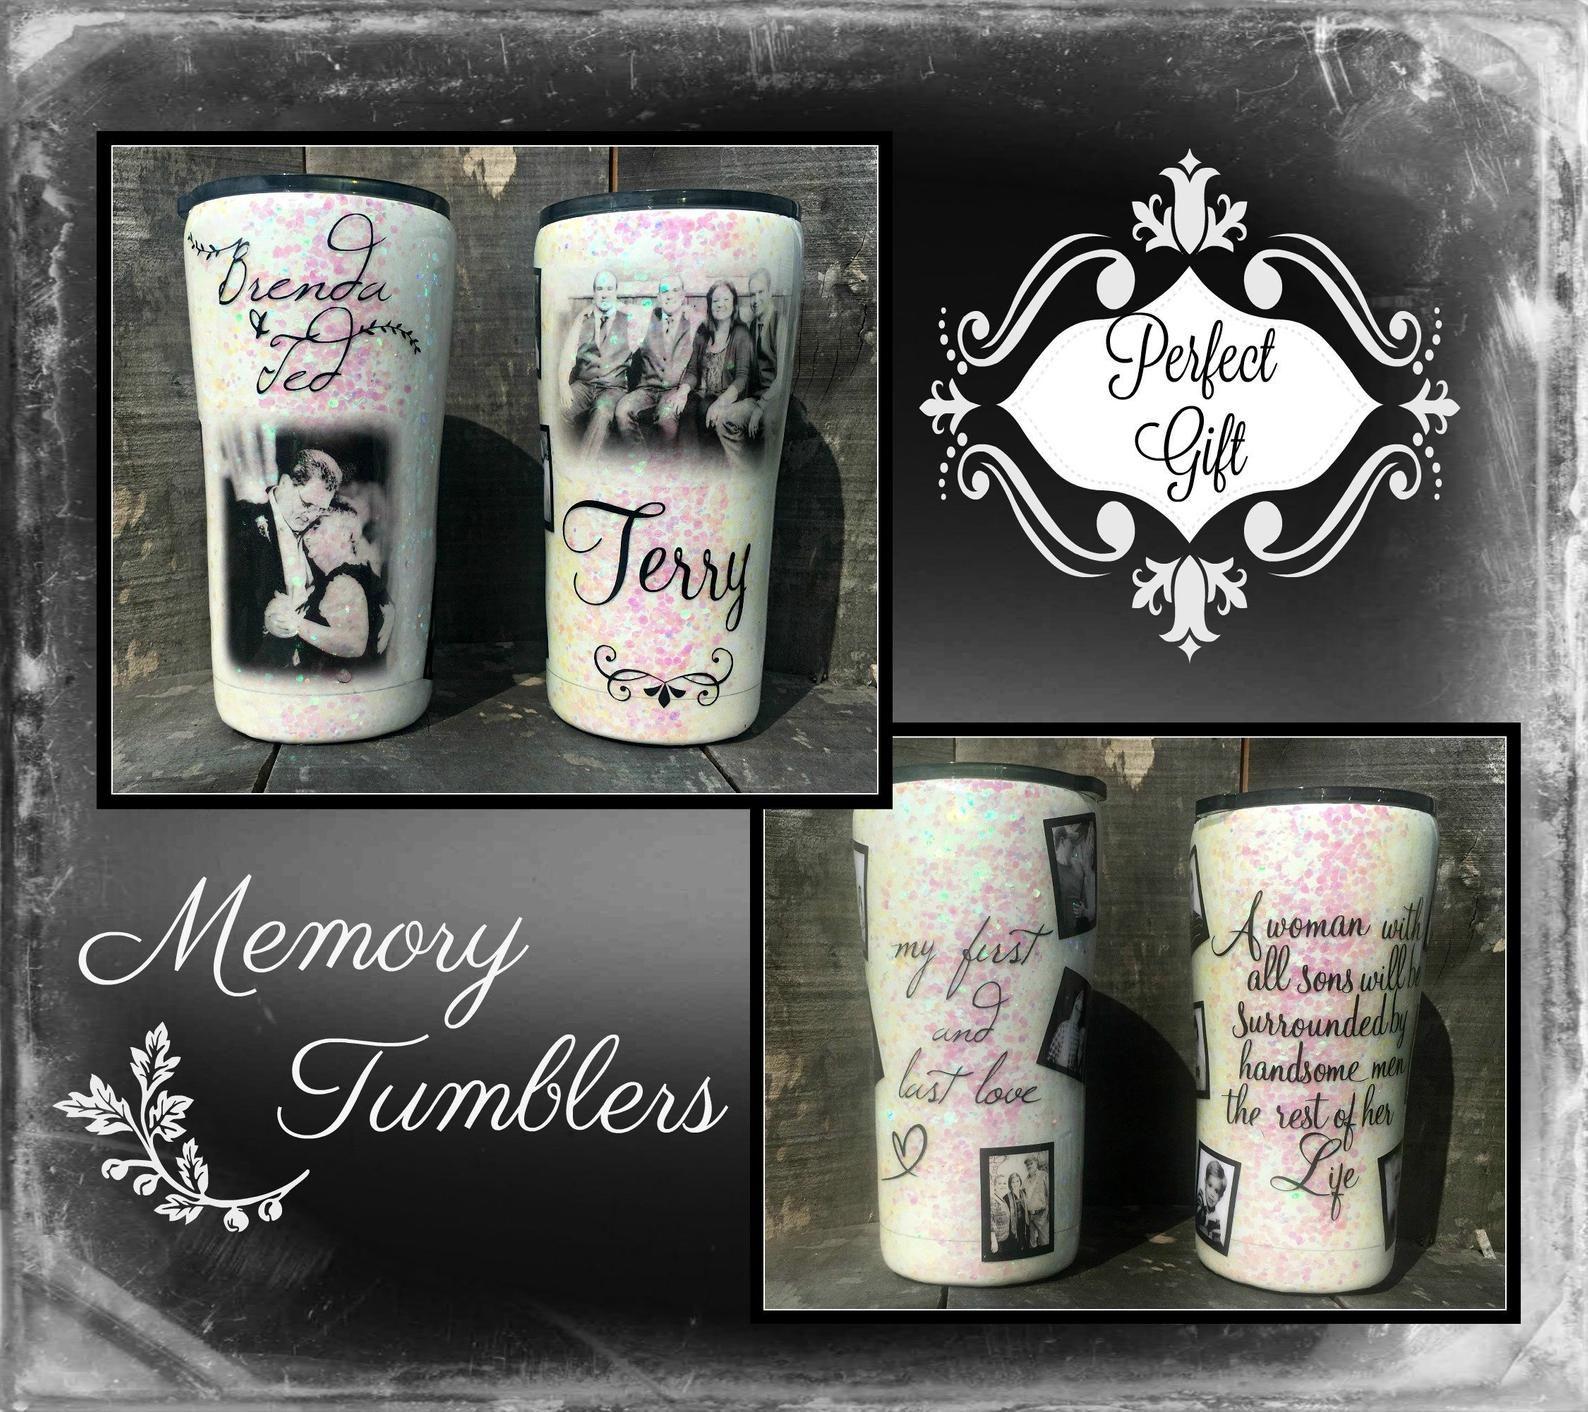 custom photo tumbler tumbler Photo tumbler gifts for him 20oz tumbler gifts for her custom tumbler